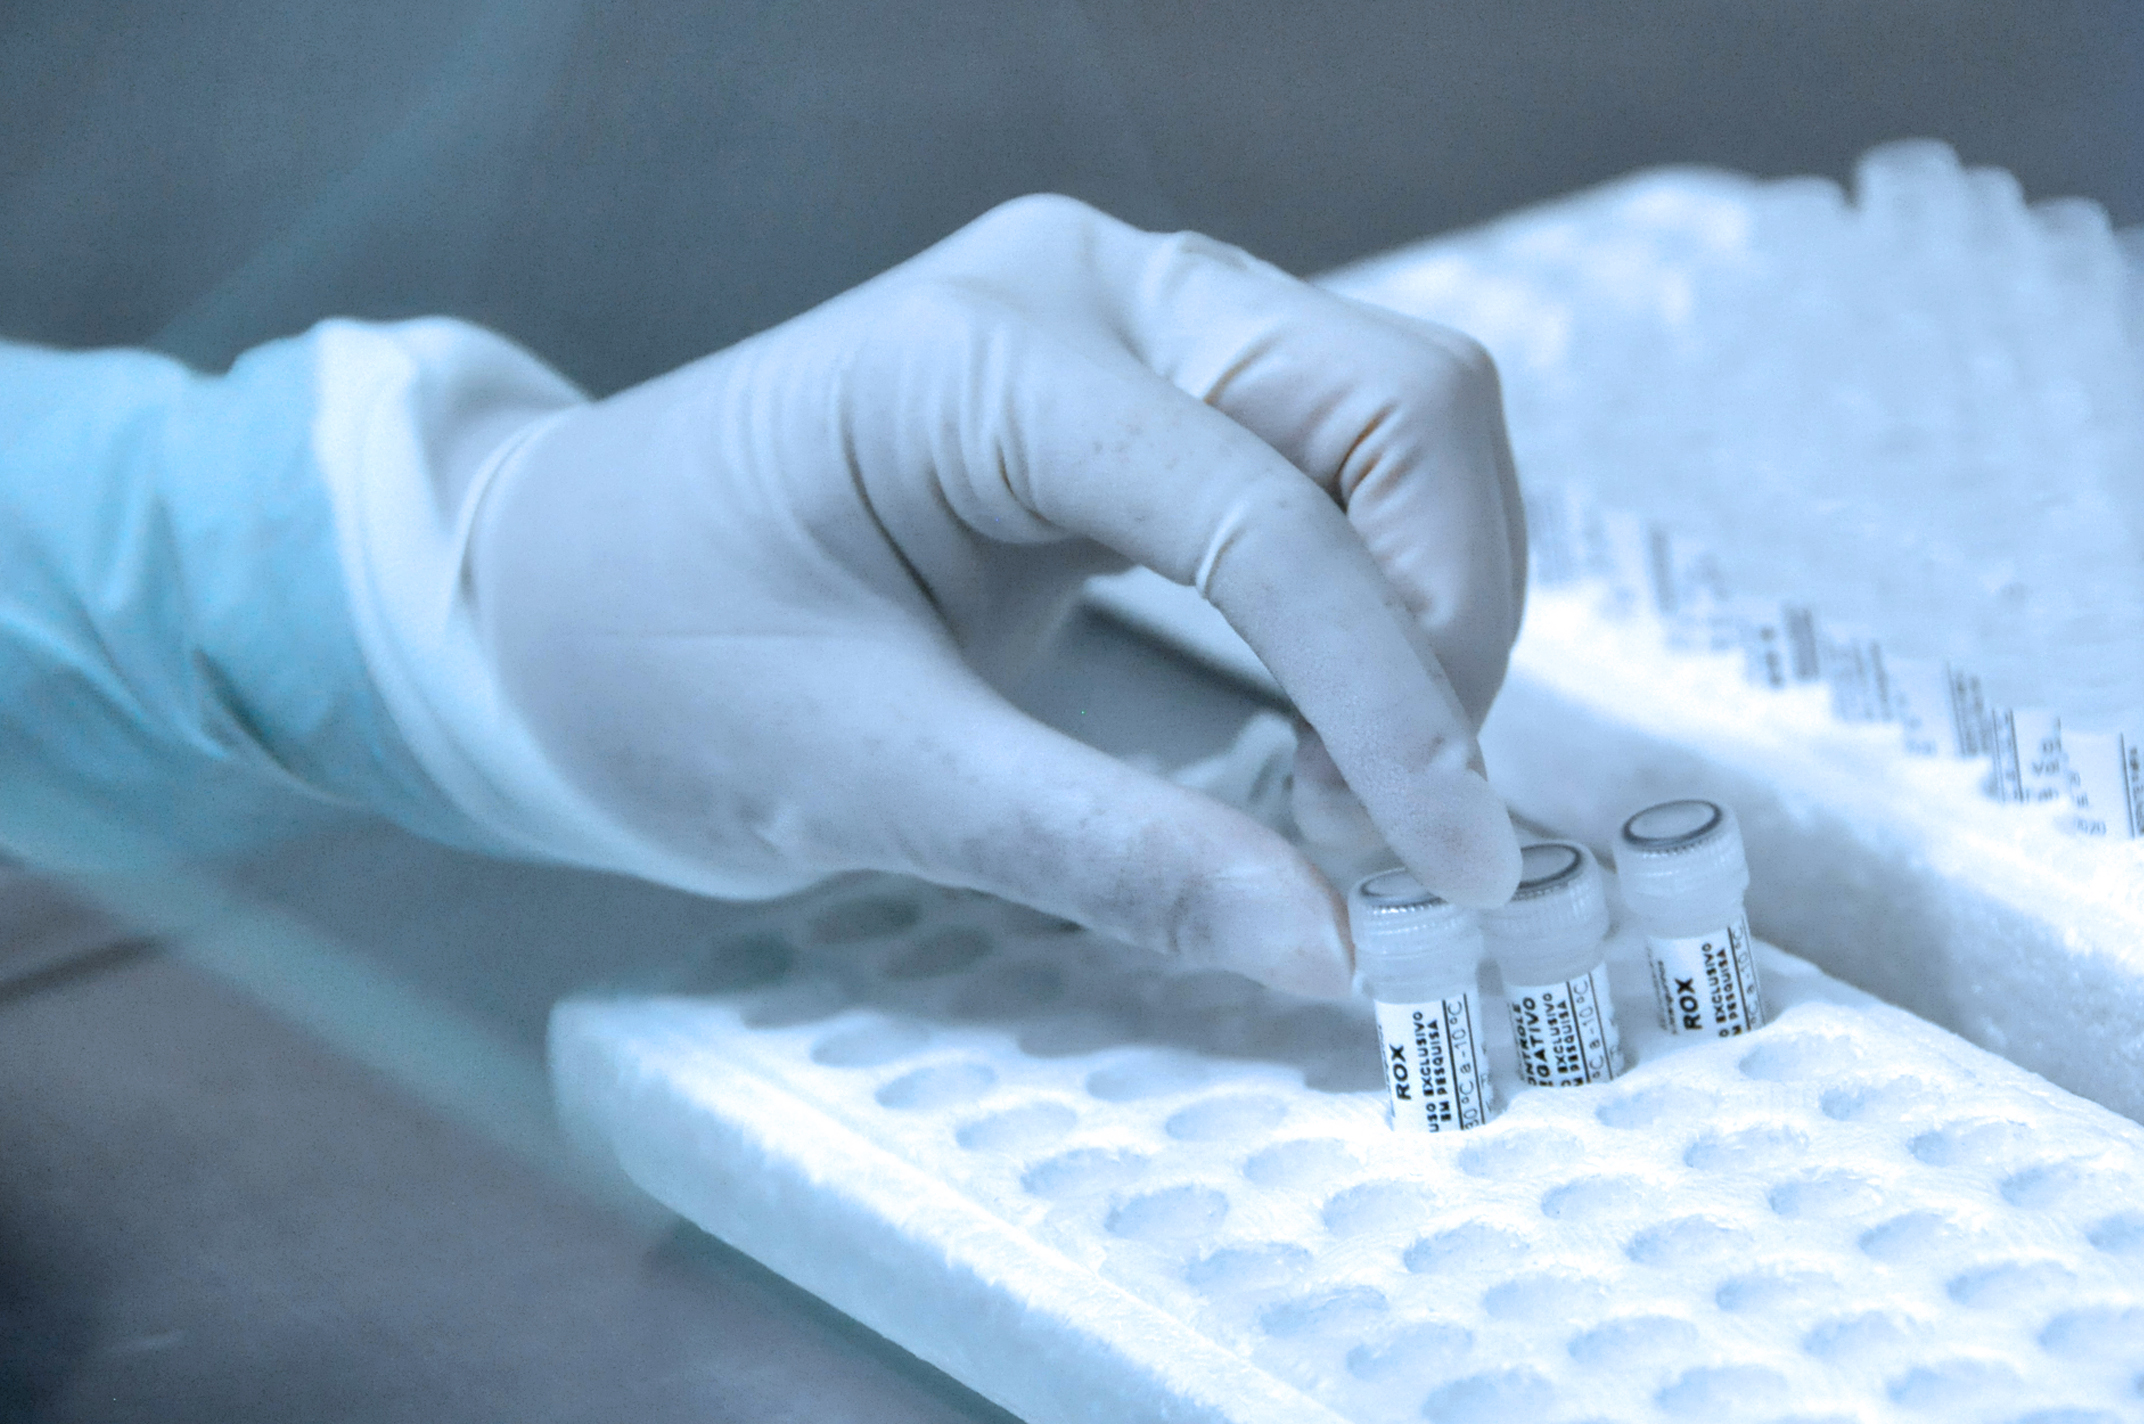 Testes para diagnóstico da Covid-19